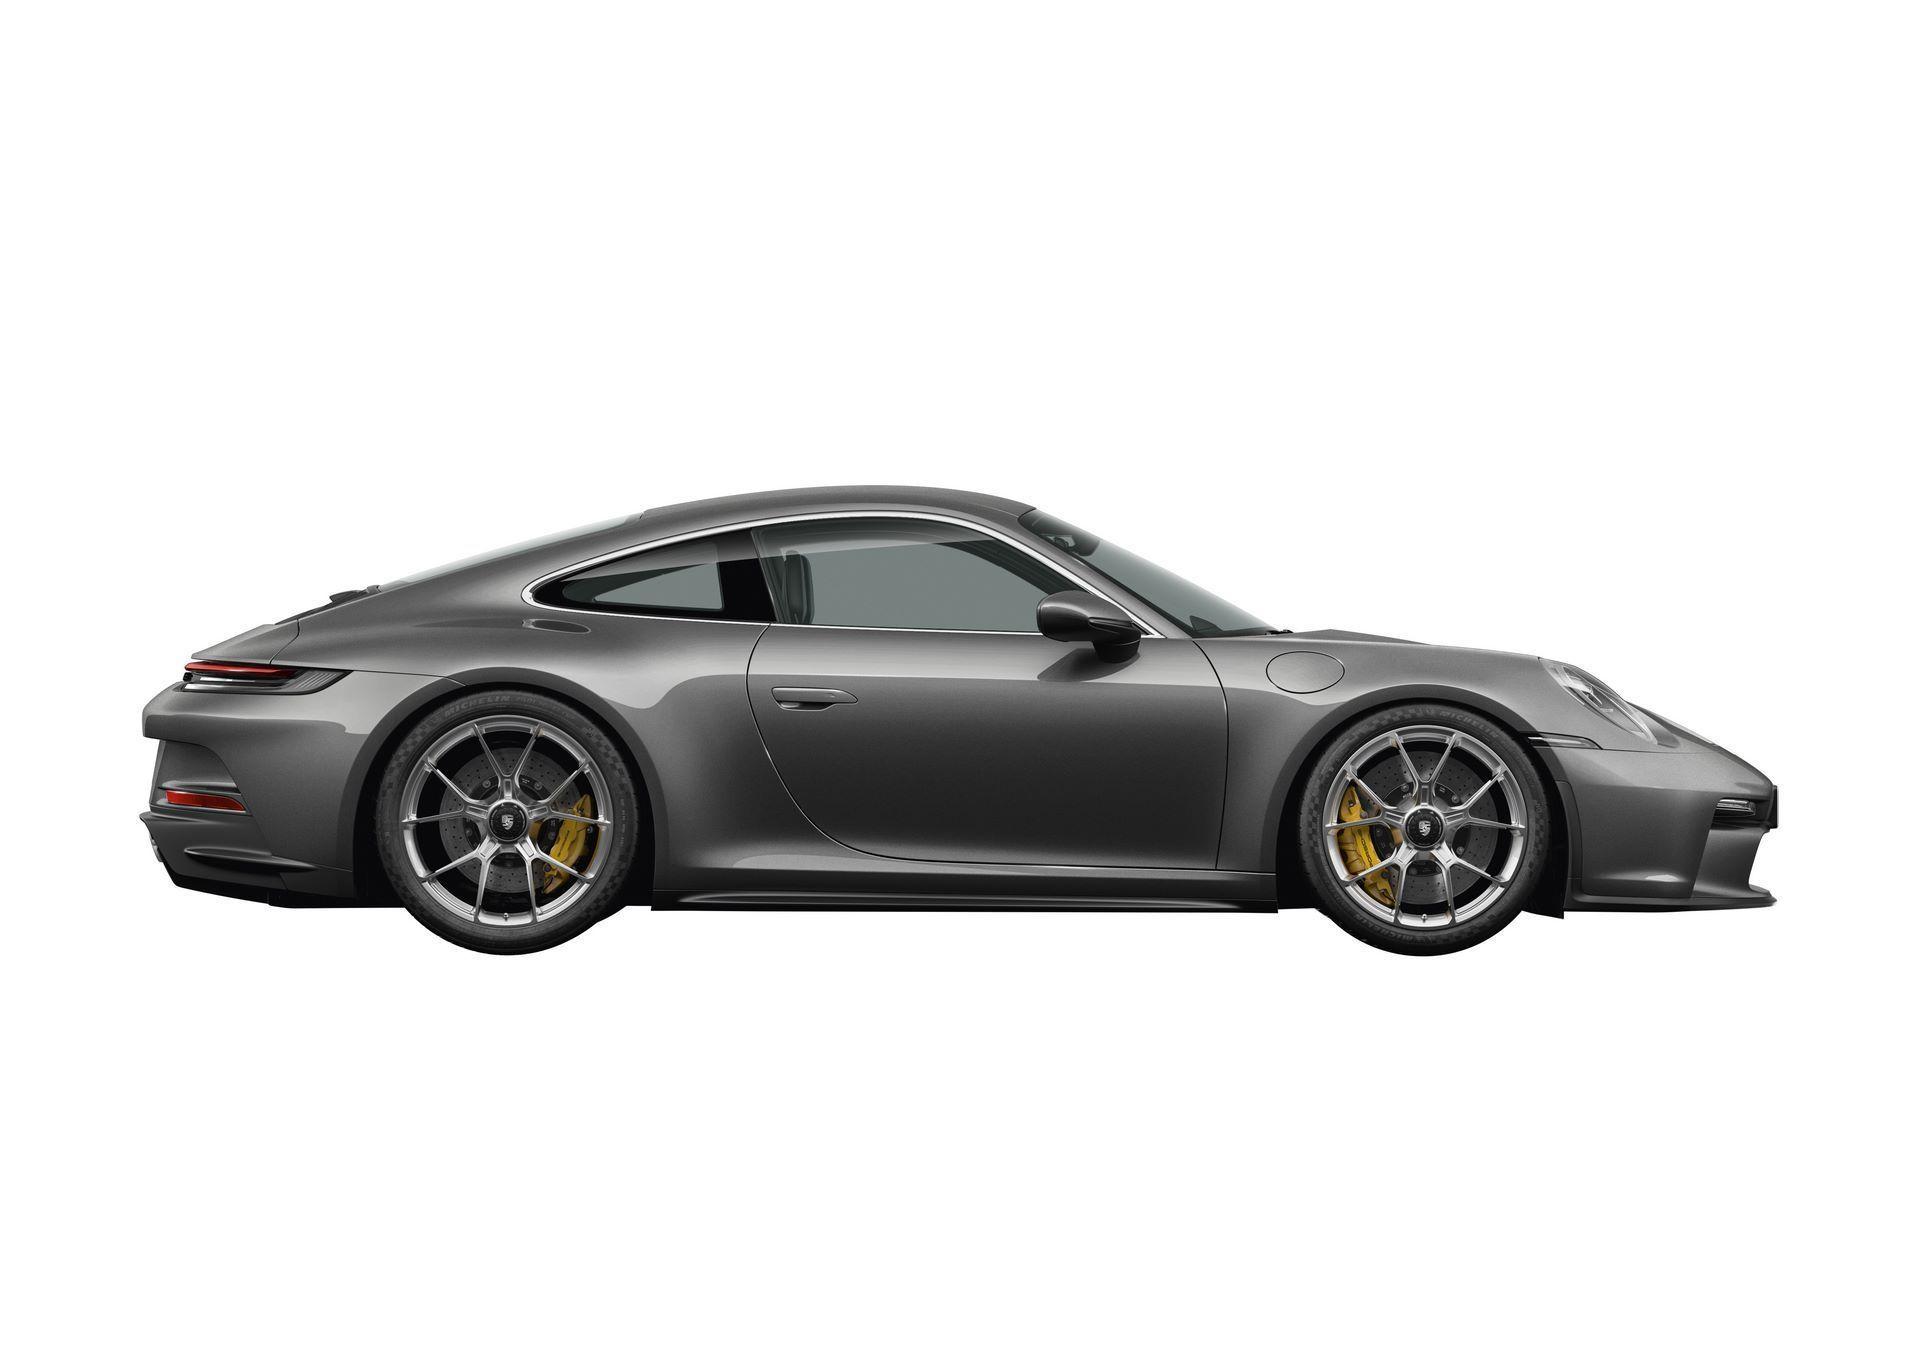 Porsche-911-GT3-Touring-Package-29